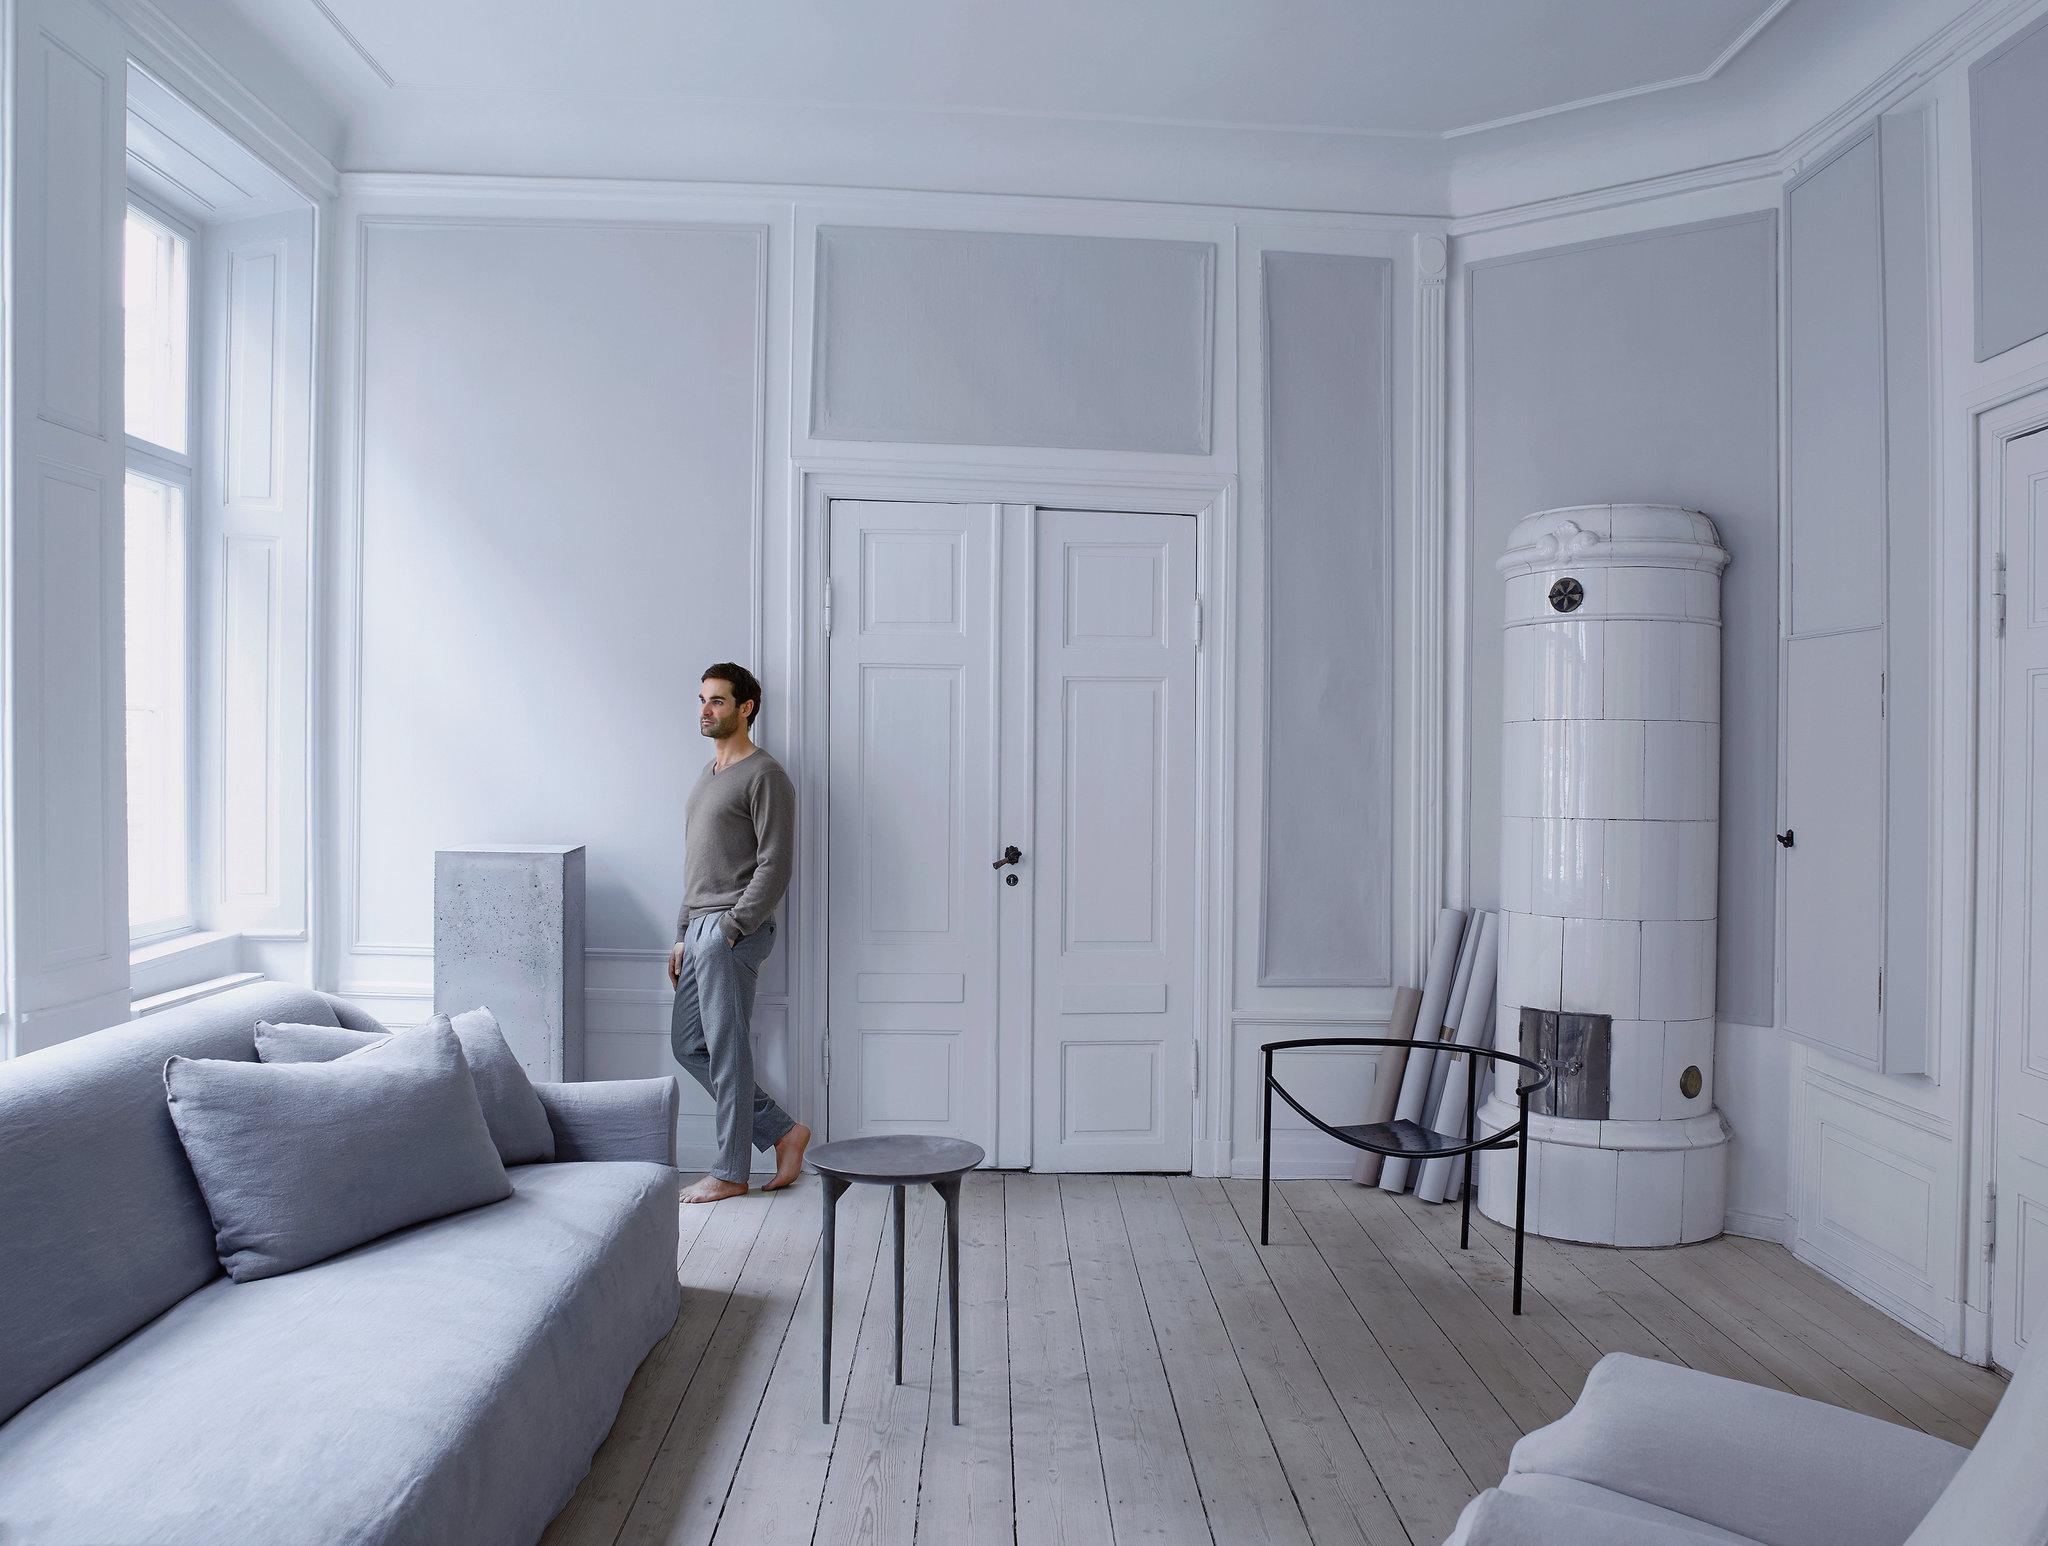 The designer at home in his living room. Photos:Henry Bourne//Le designer chez lui dans son salon.Photos :Henry Bourne